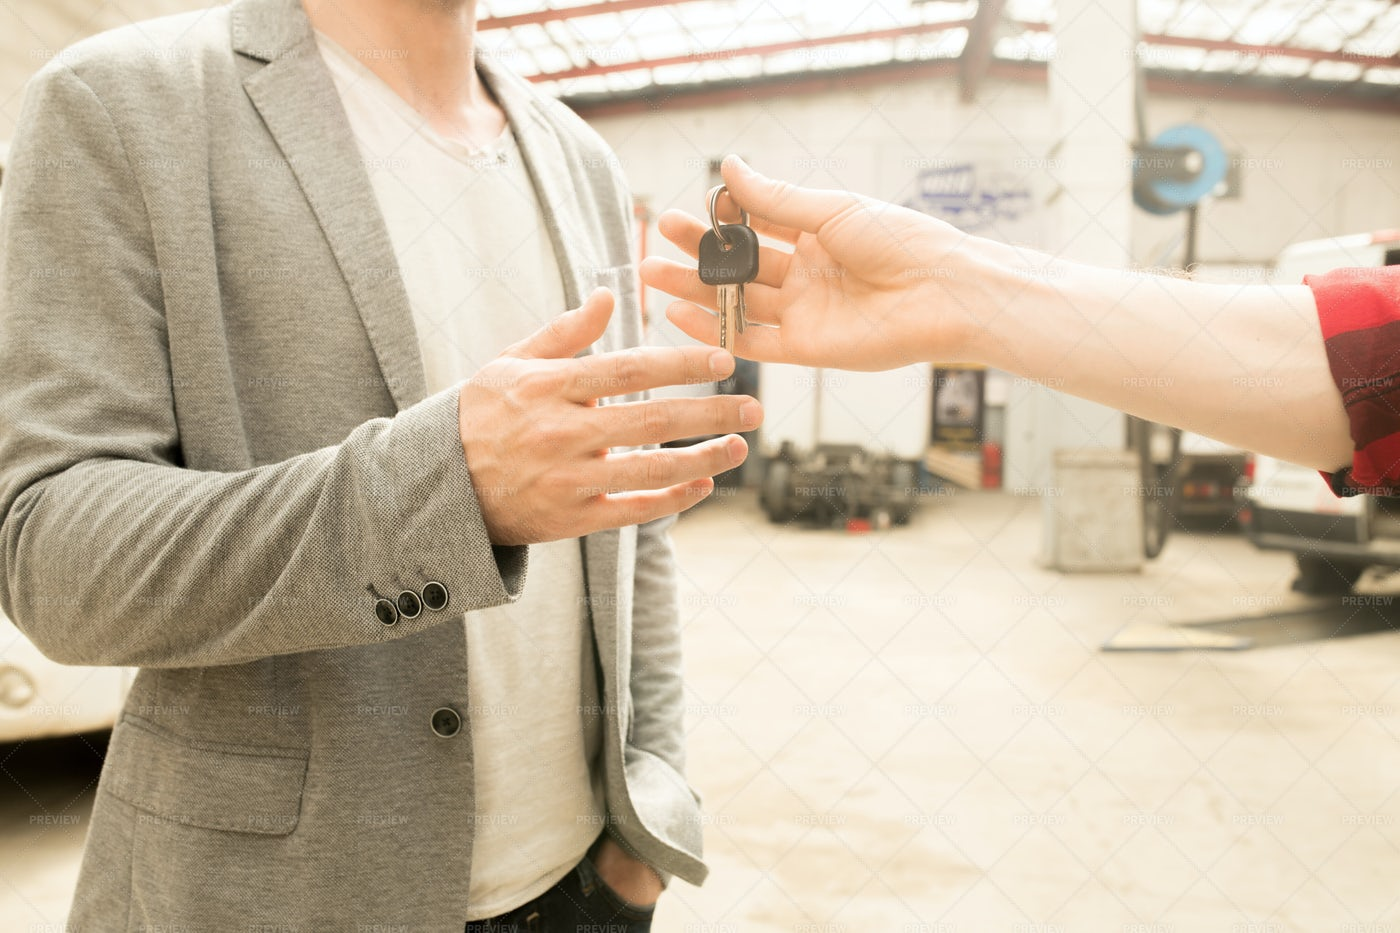 Customer Getting Car Keys After...: Stock Photos